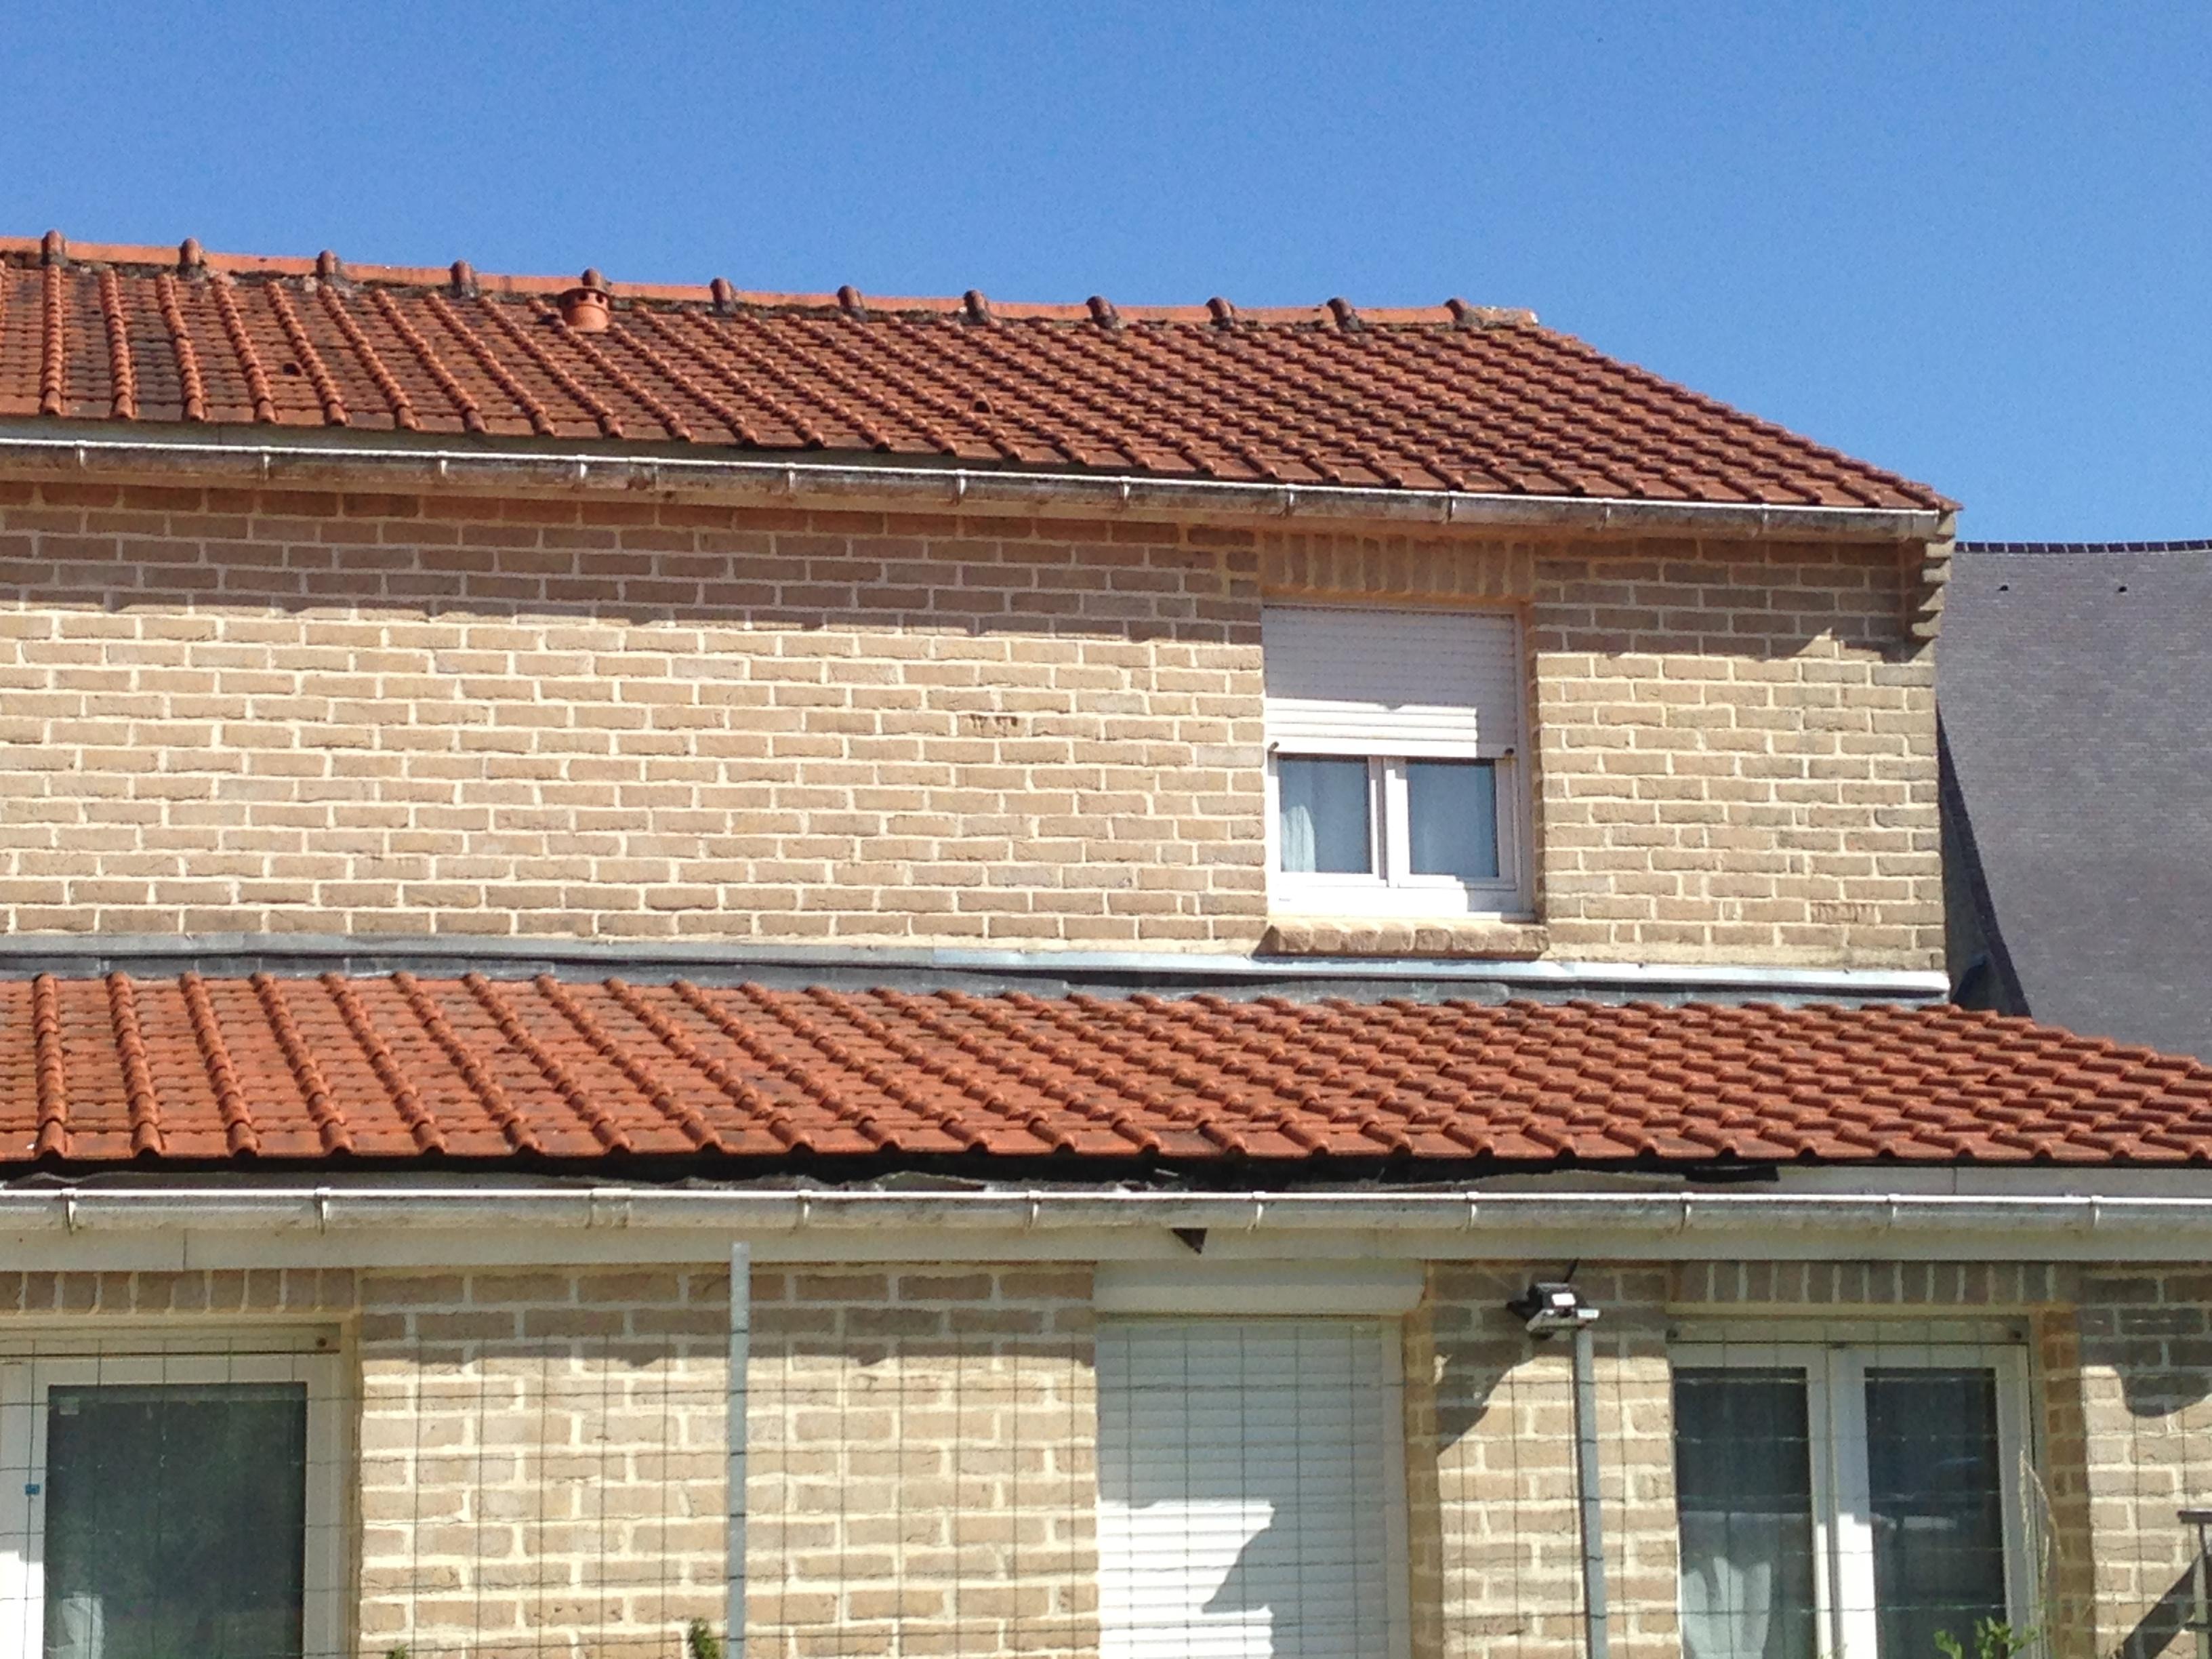 Re: Infiltrations toiture tuiles pente faible - Communauté Leroy Merlin